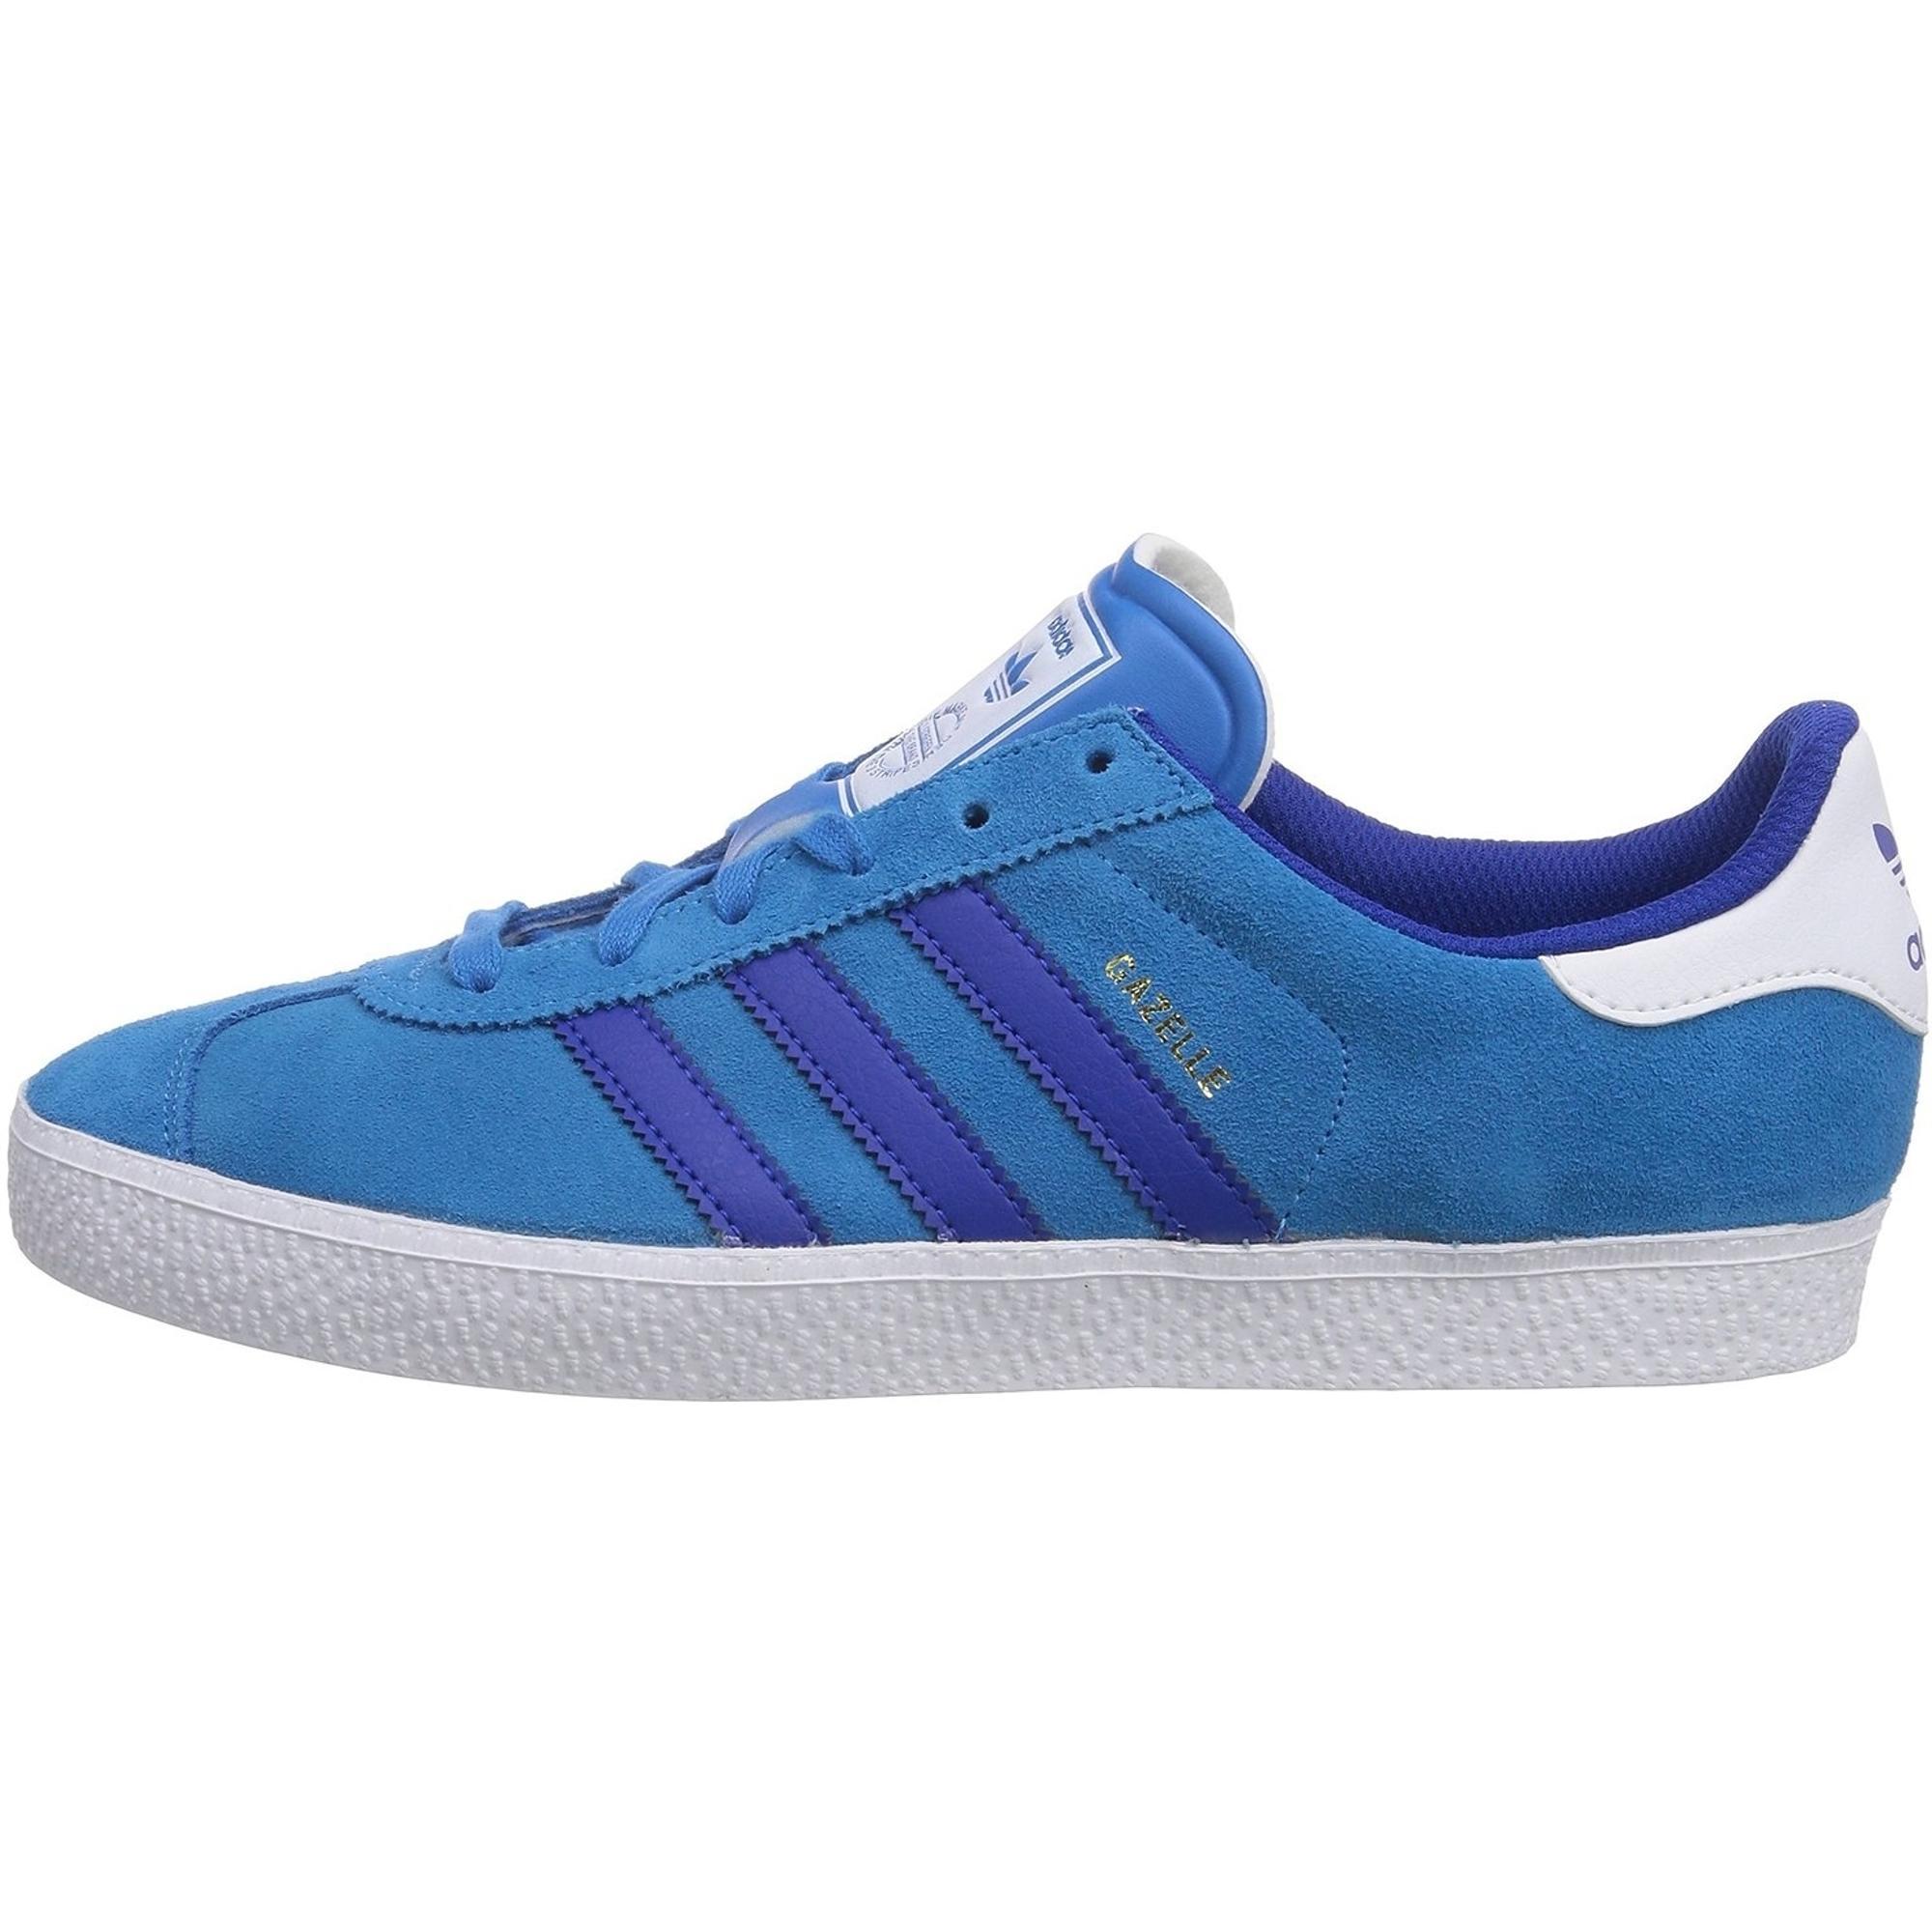 adidas Originals Gazelle 2 Blu Solare Scamosciato Gioventù